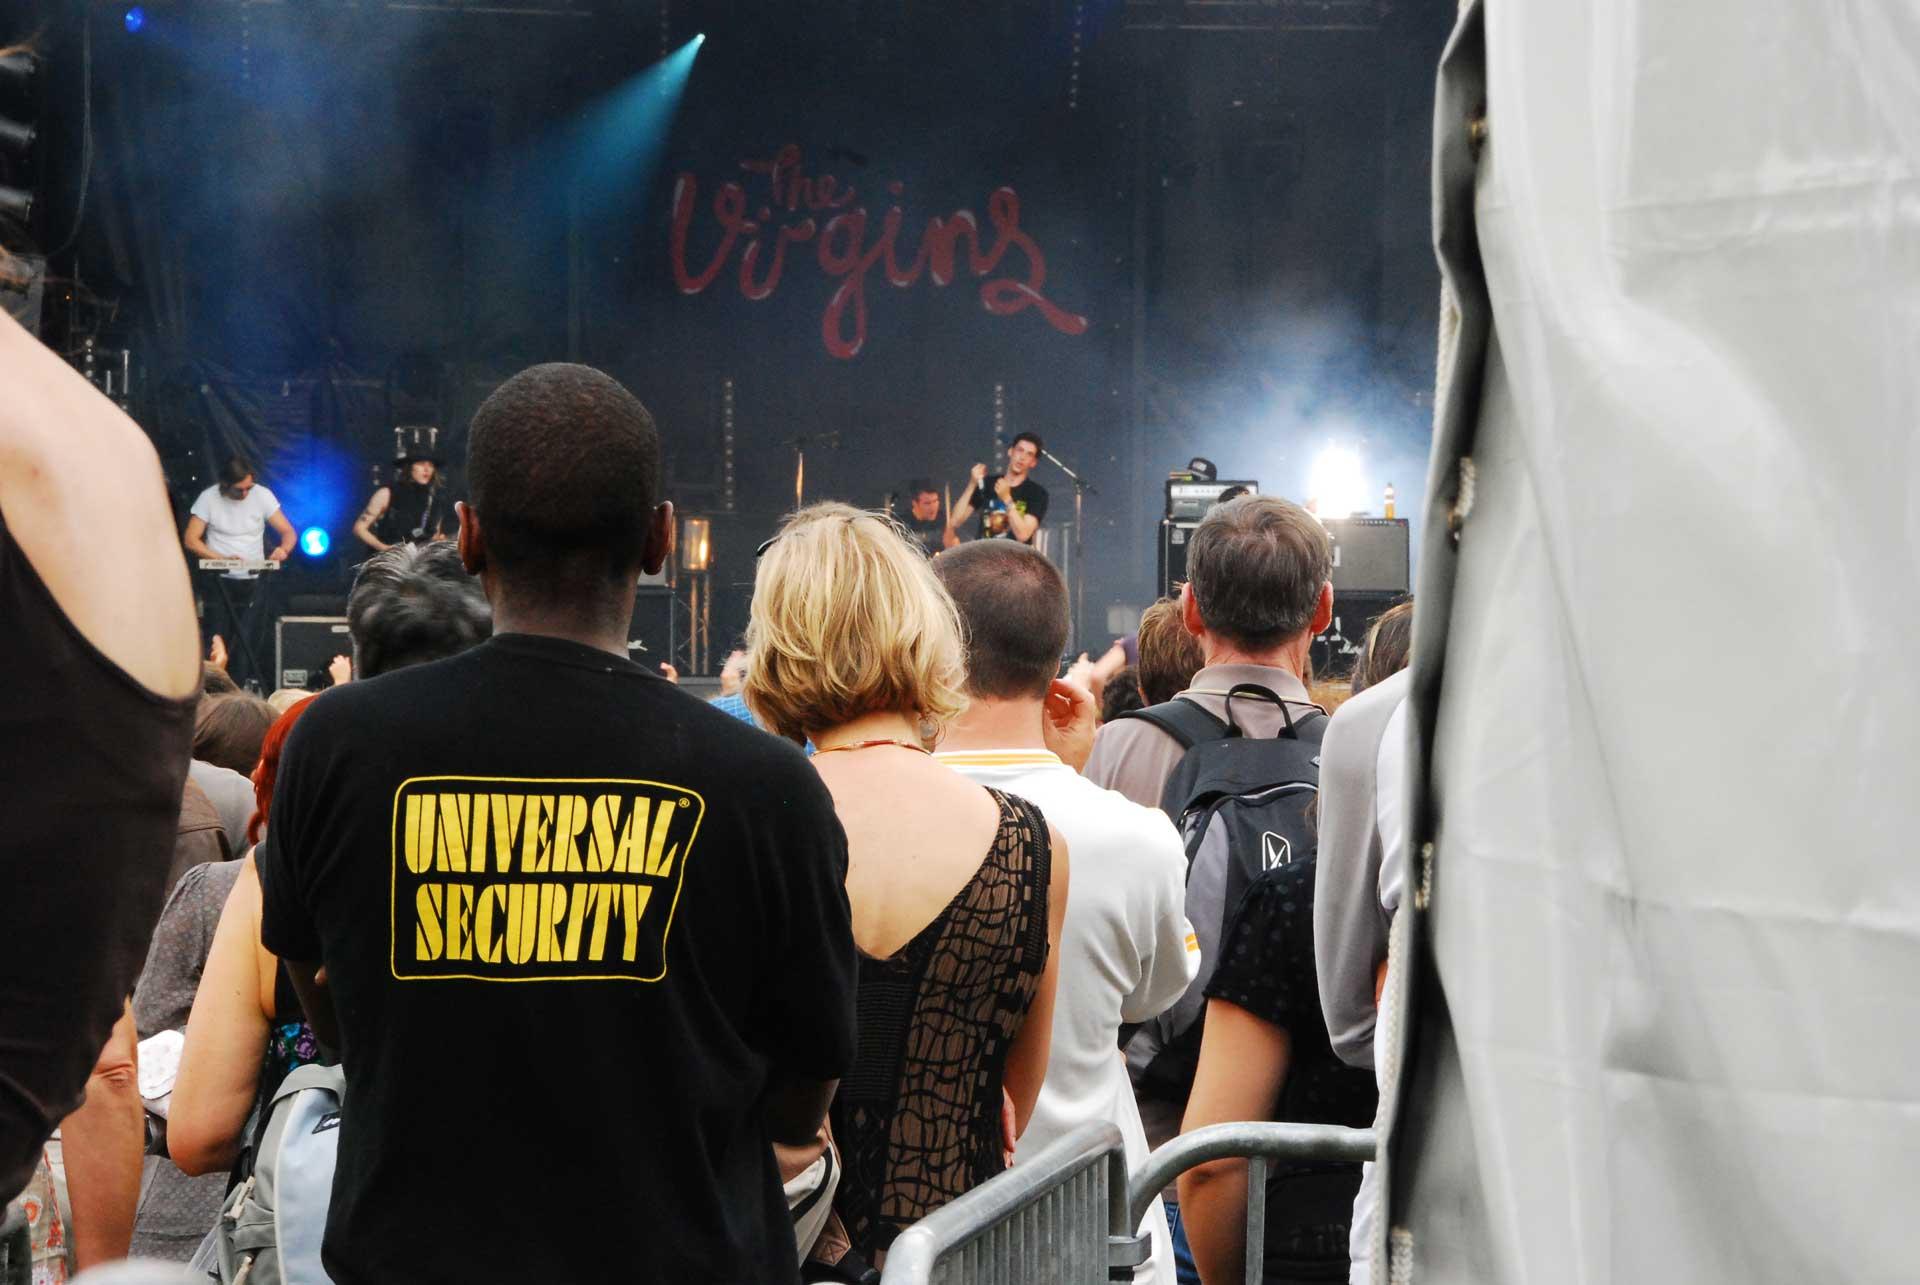 beauregard-festival-universal-security normandie